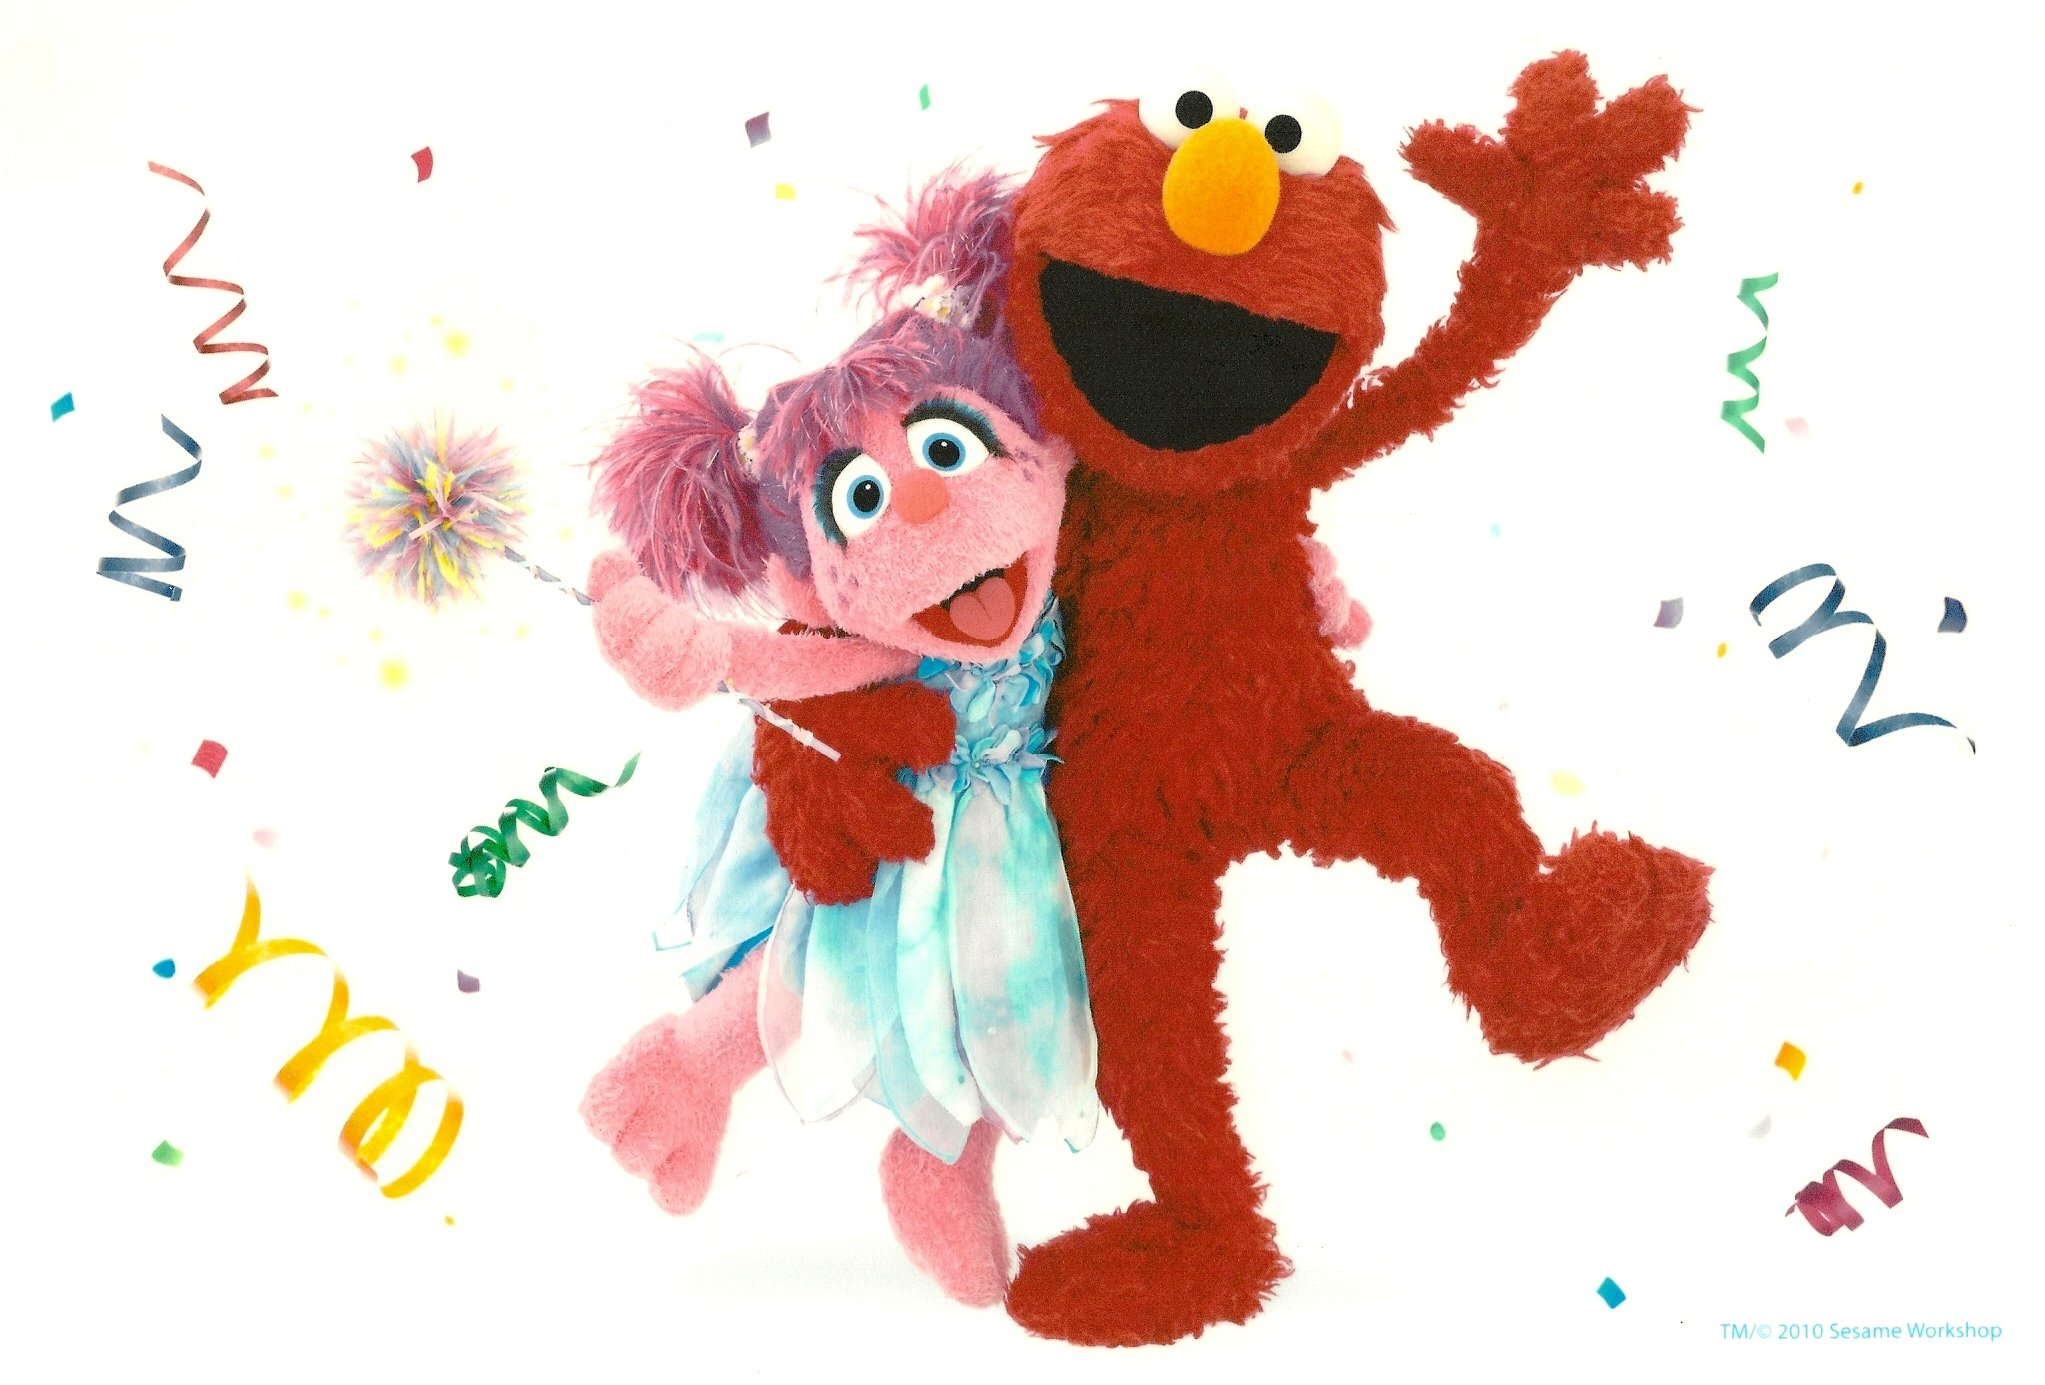 Sensational Sesame Street Elmo Abby Cadabby Birthday Edible Image Cake Personalised Birthday Cards Veneteletsinfo